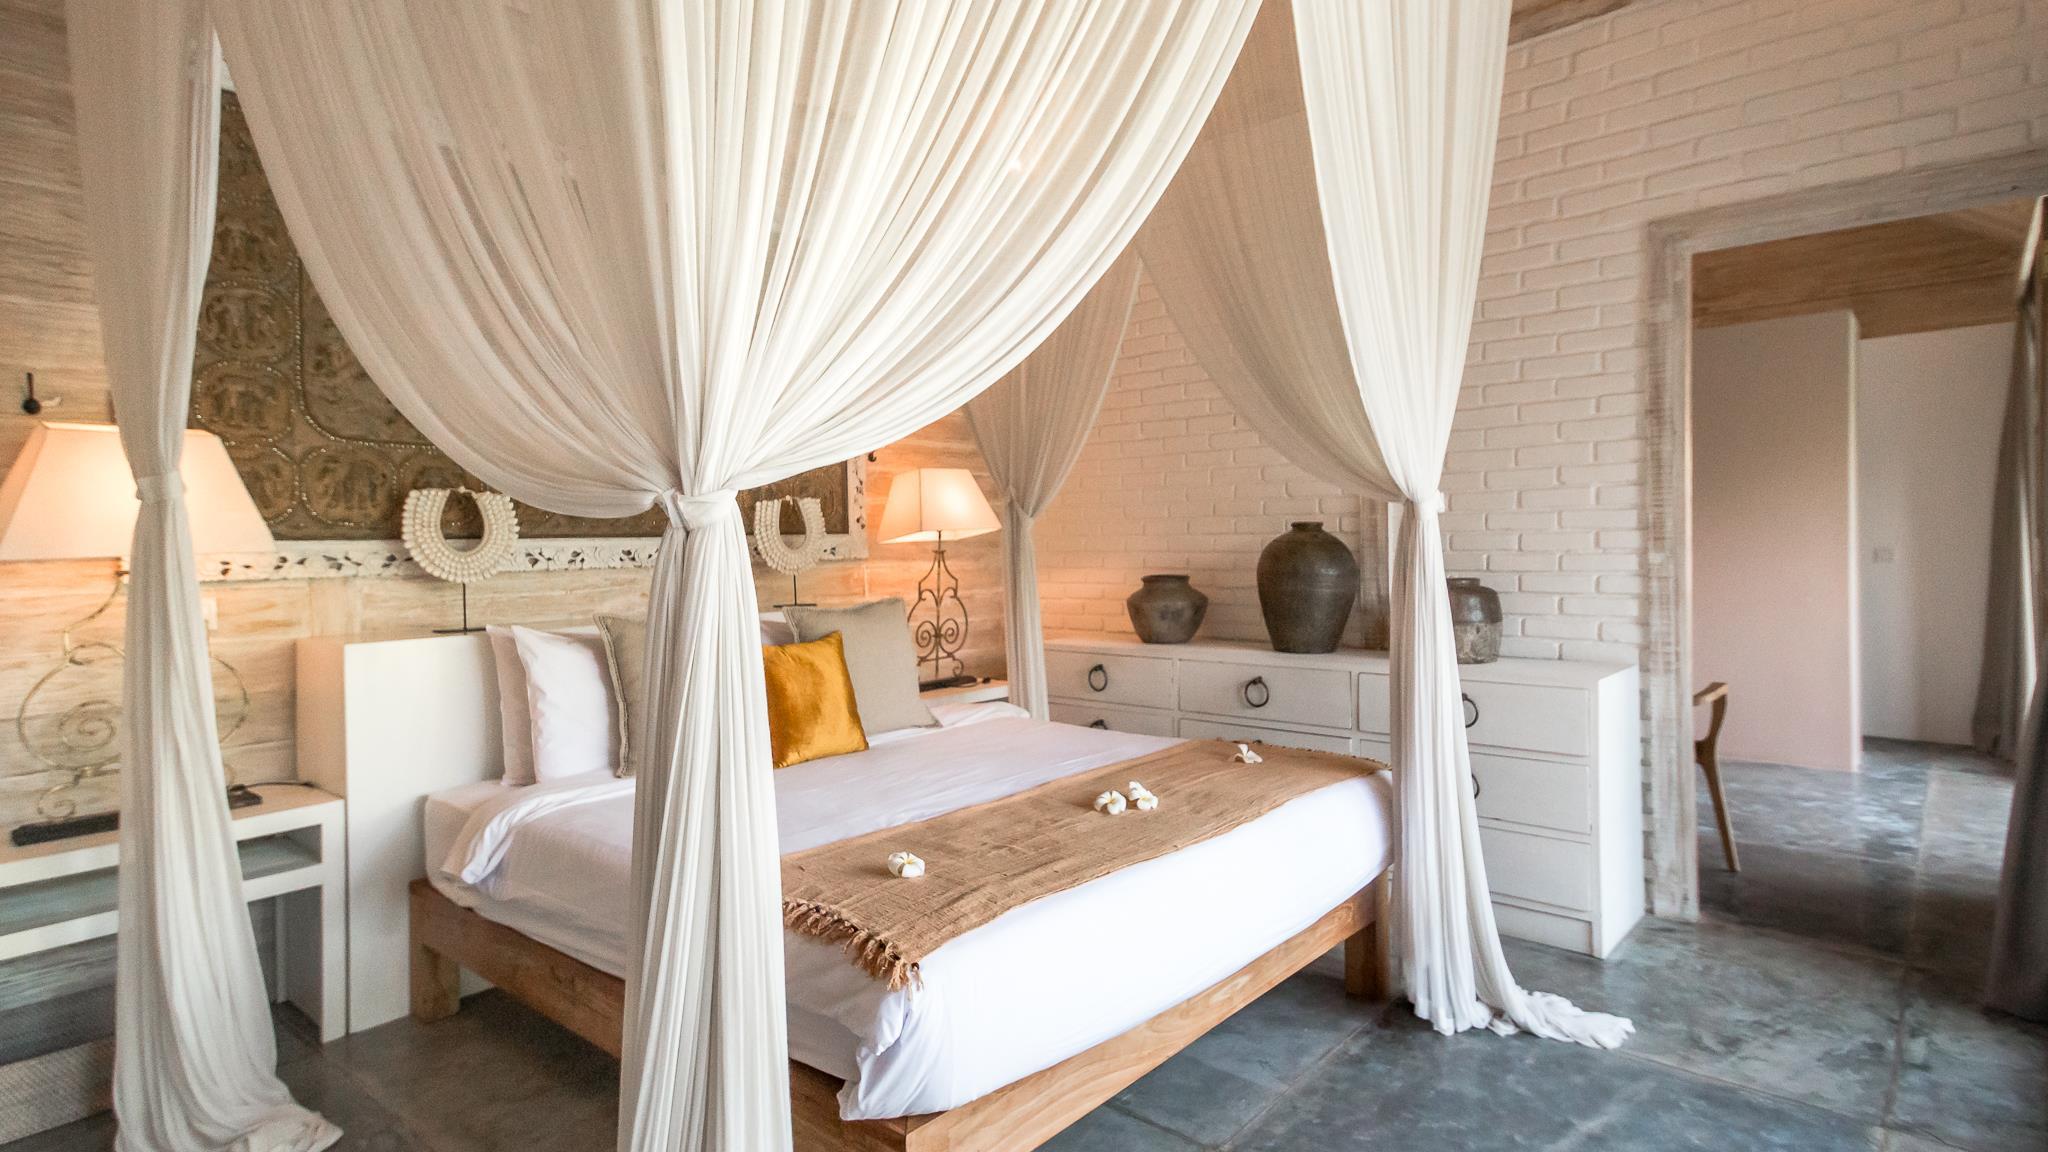 Bedroom with Table Lamps - Villa Little Mannao - Kerobokan, Bali